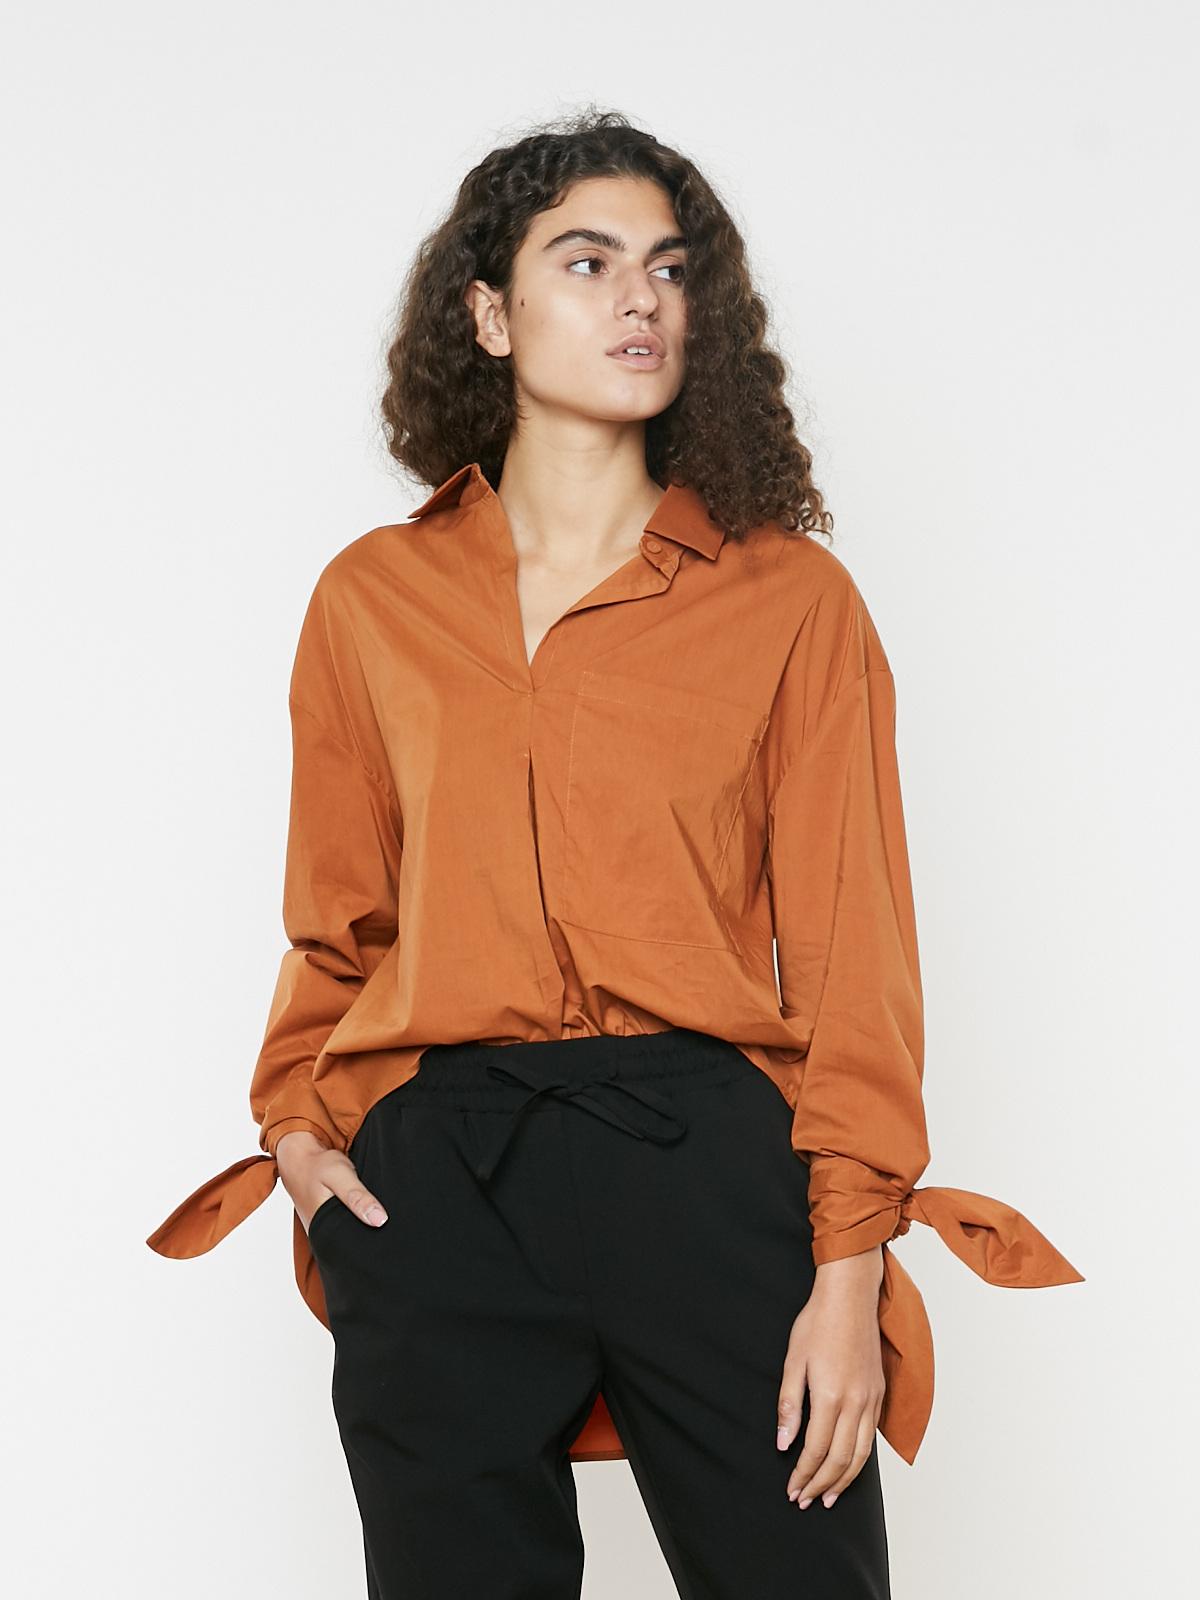 Рубашка с карманом и завязками на рукавах